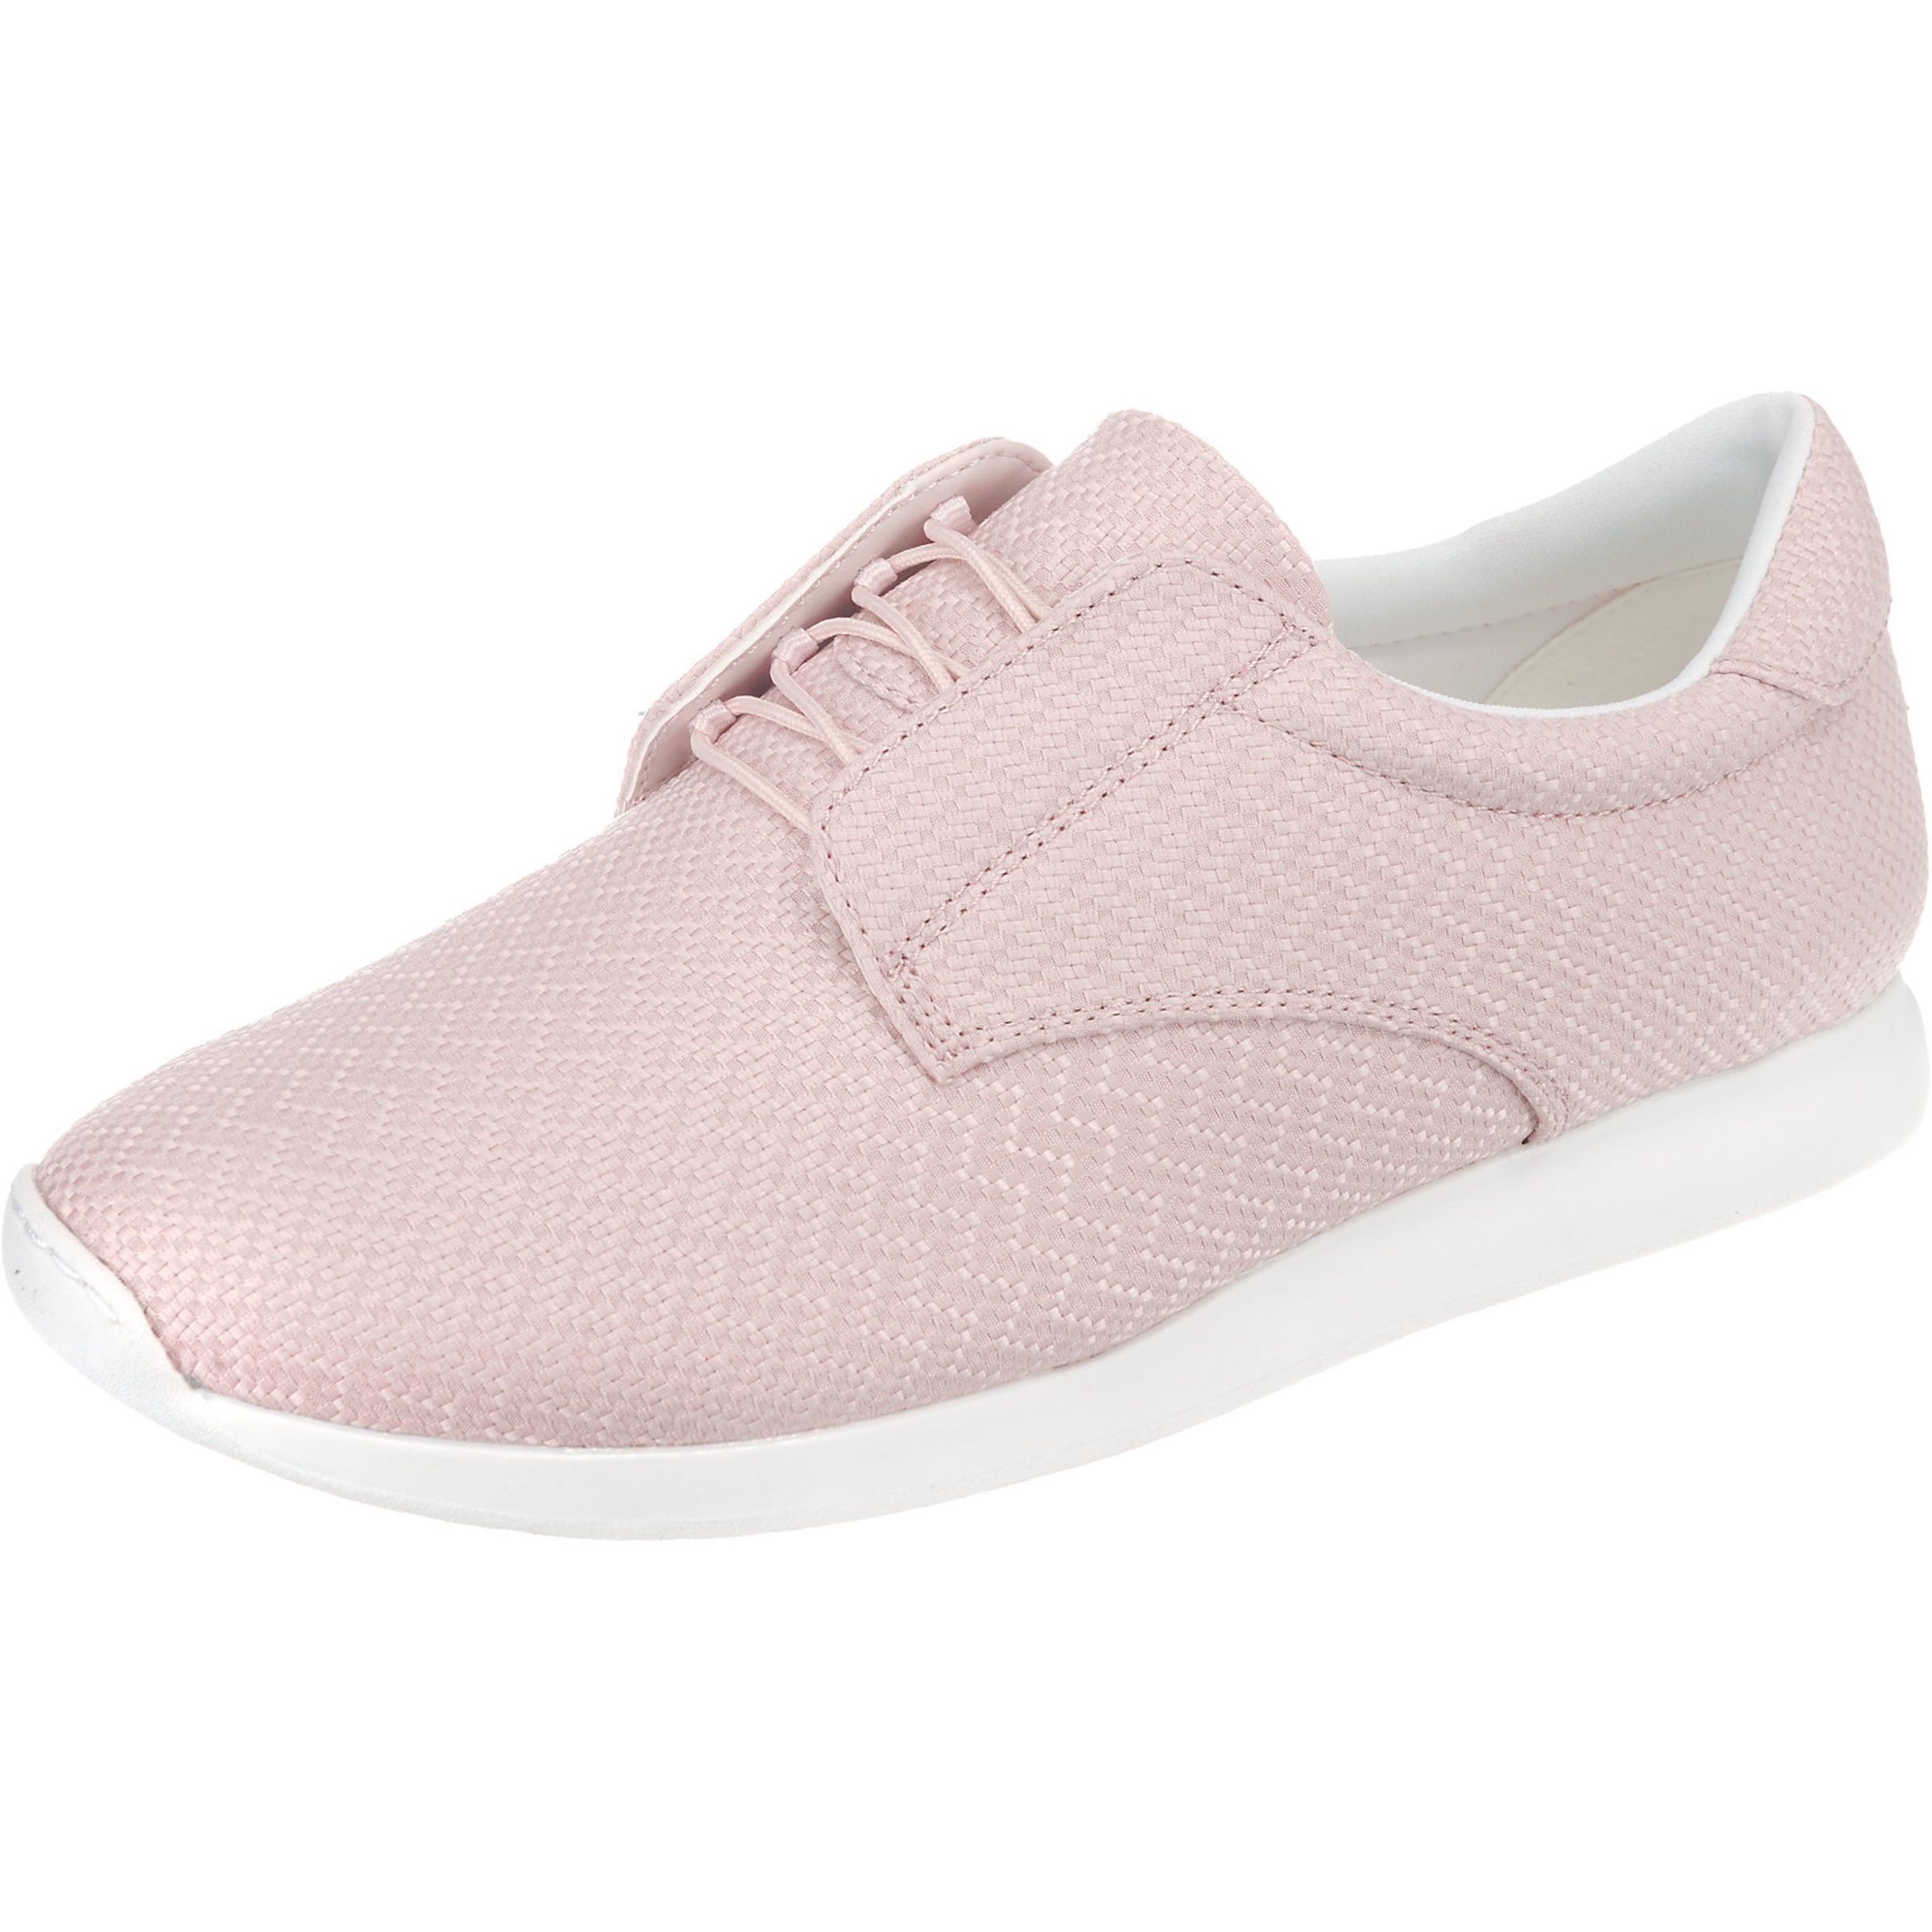 VAGABOND SHOEMAKERS Sneaker Kasai 2.0 Hohe Qualität